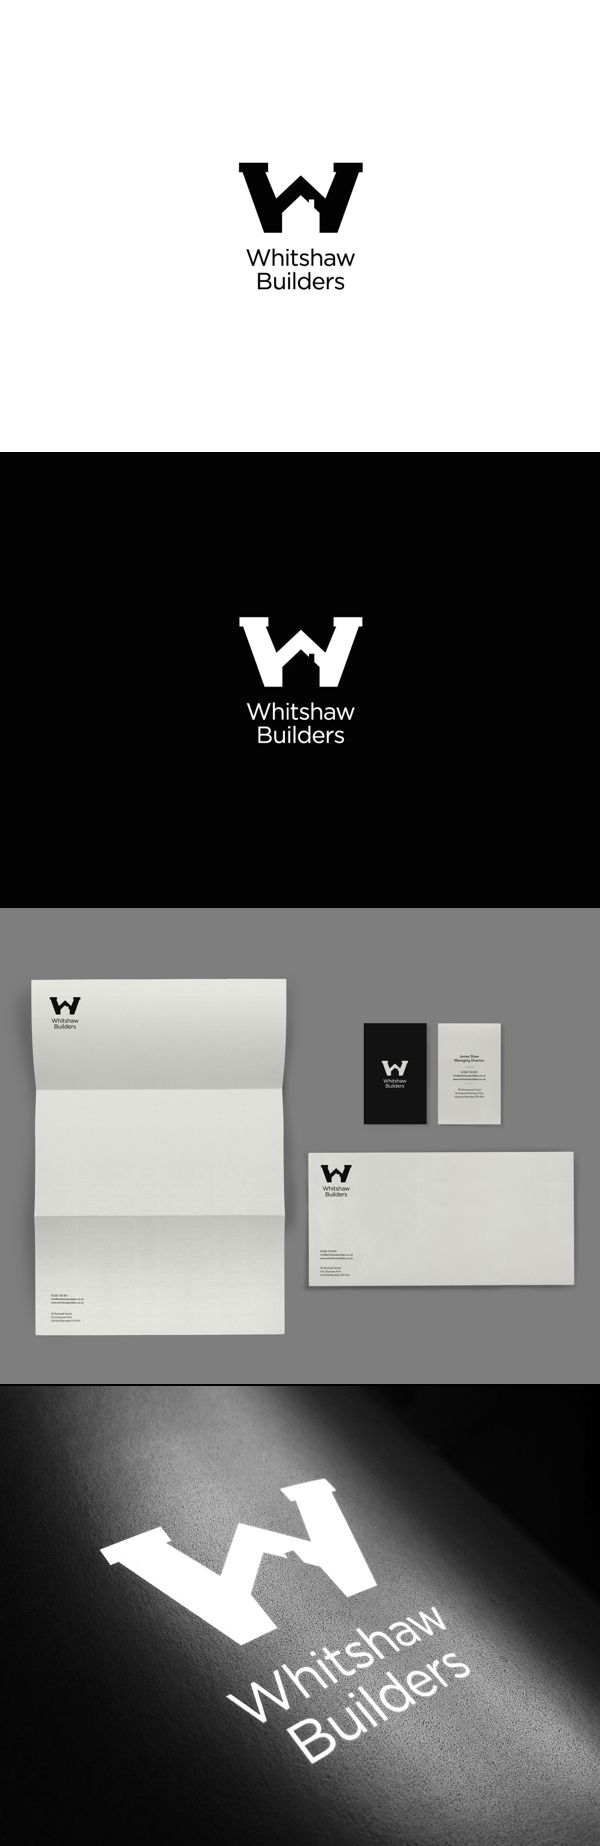 Whitshaw Builders Brand Identity via Behance.